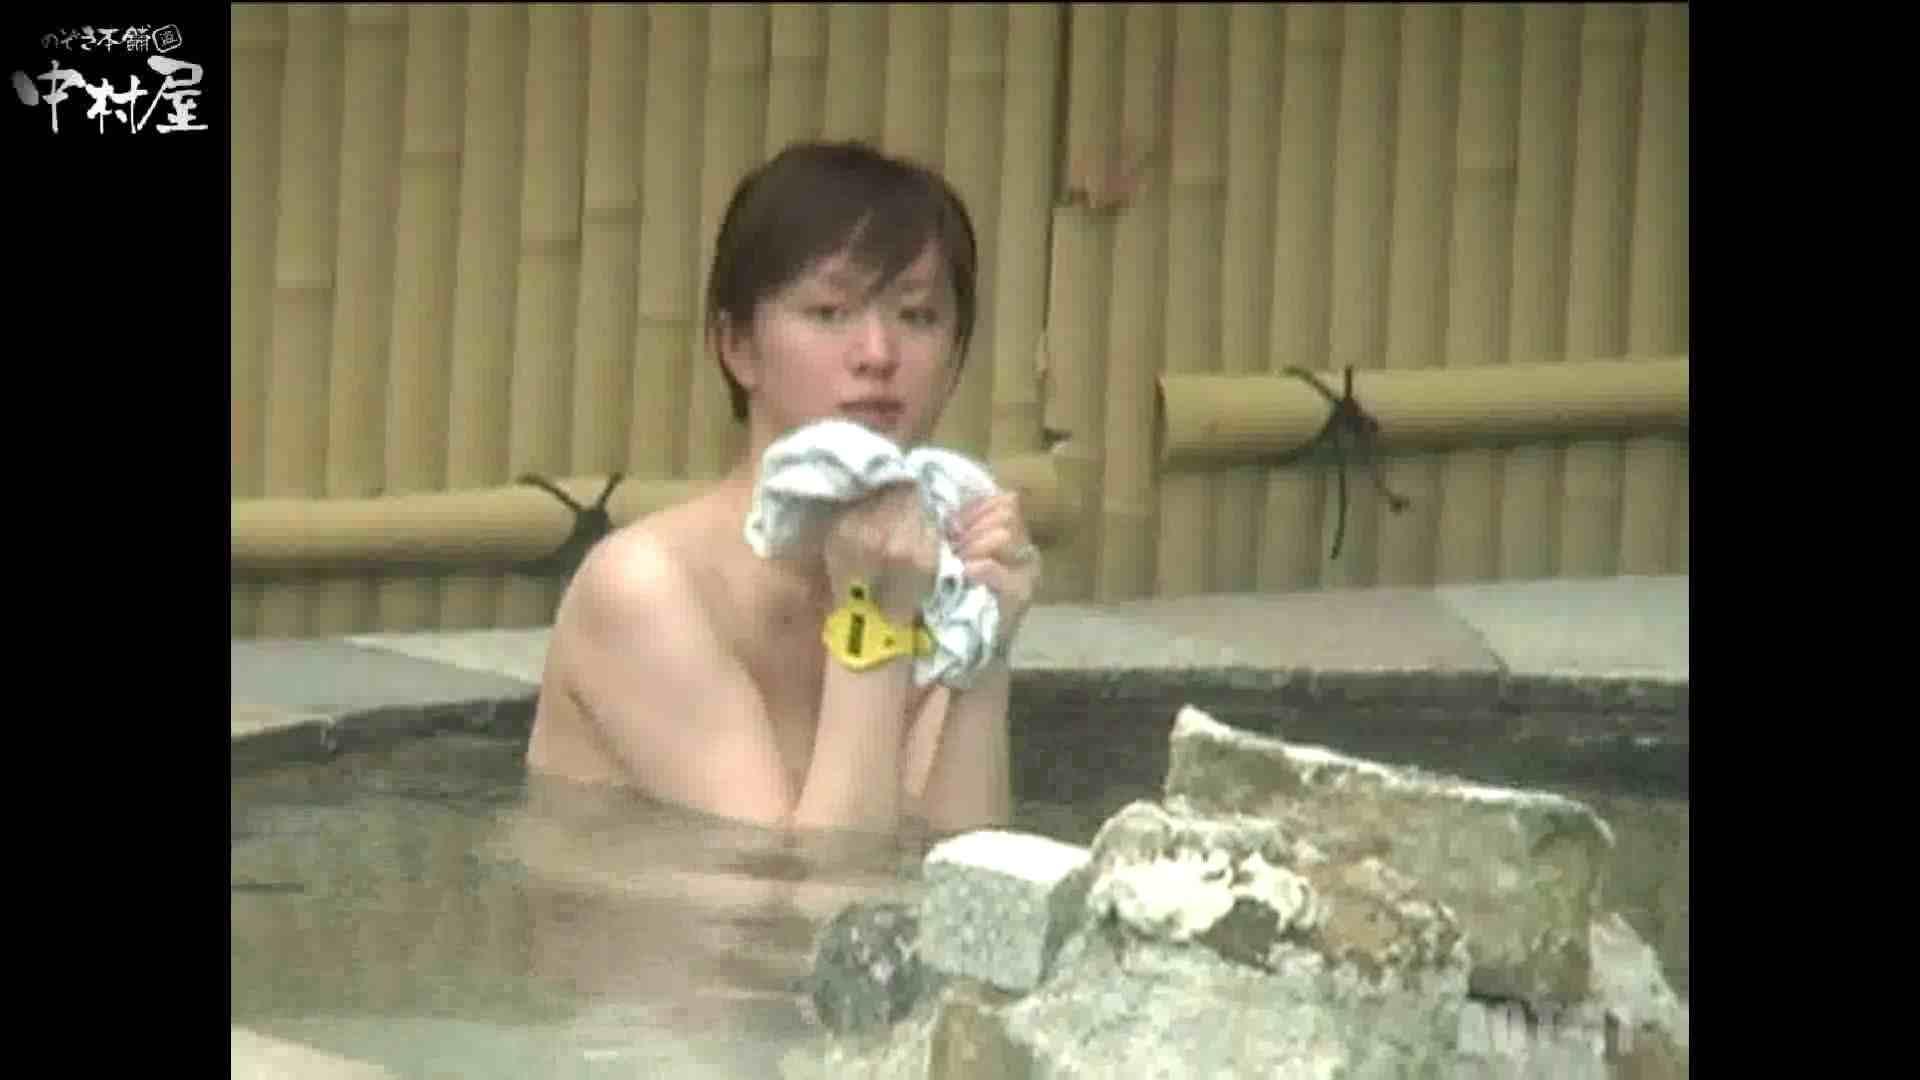 Aquaな露天風呂Vol.875潜入盗撮露天風呂十一判湯 其の一 盗撮師作品  96pic 60